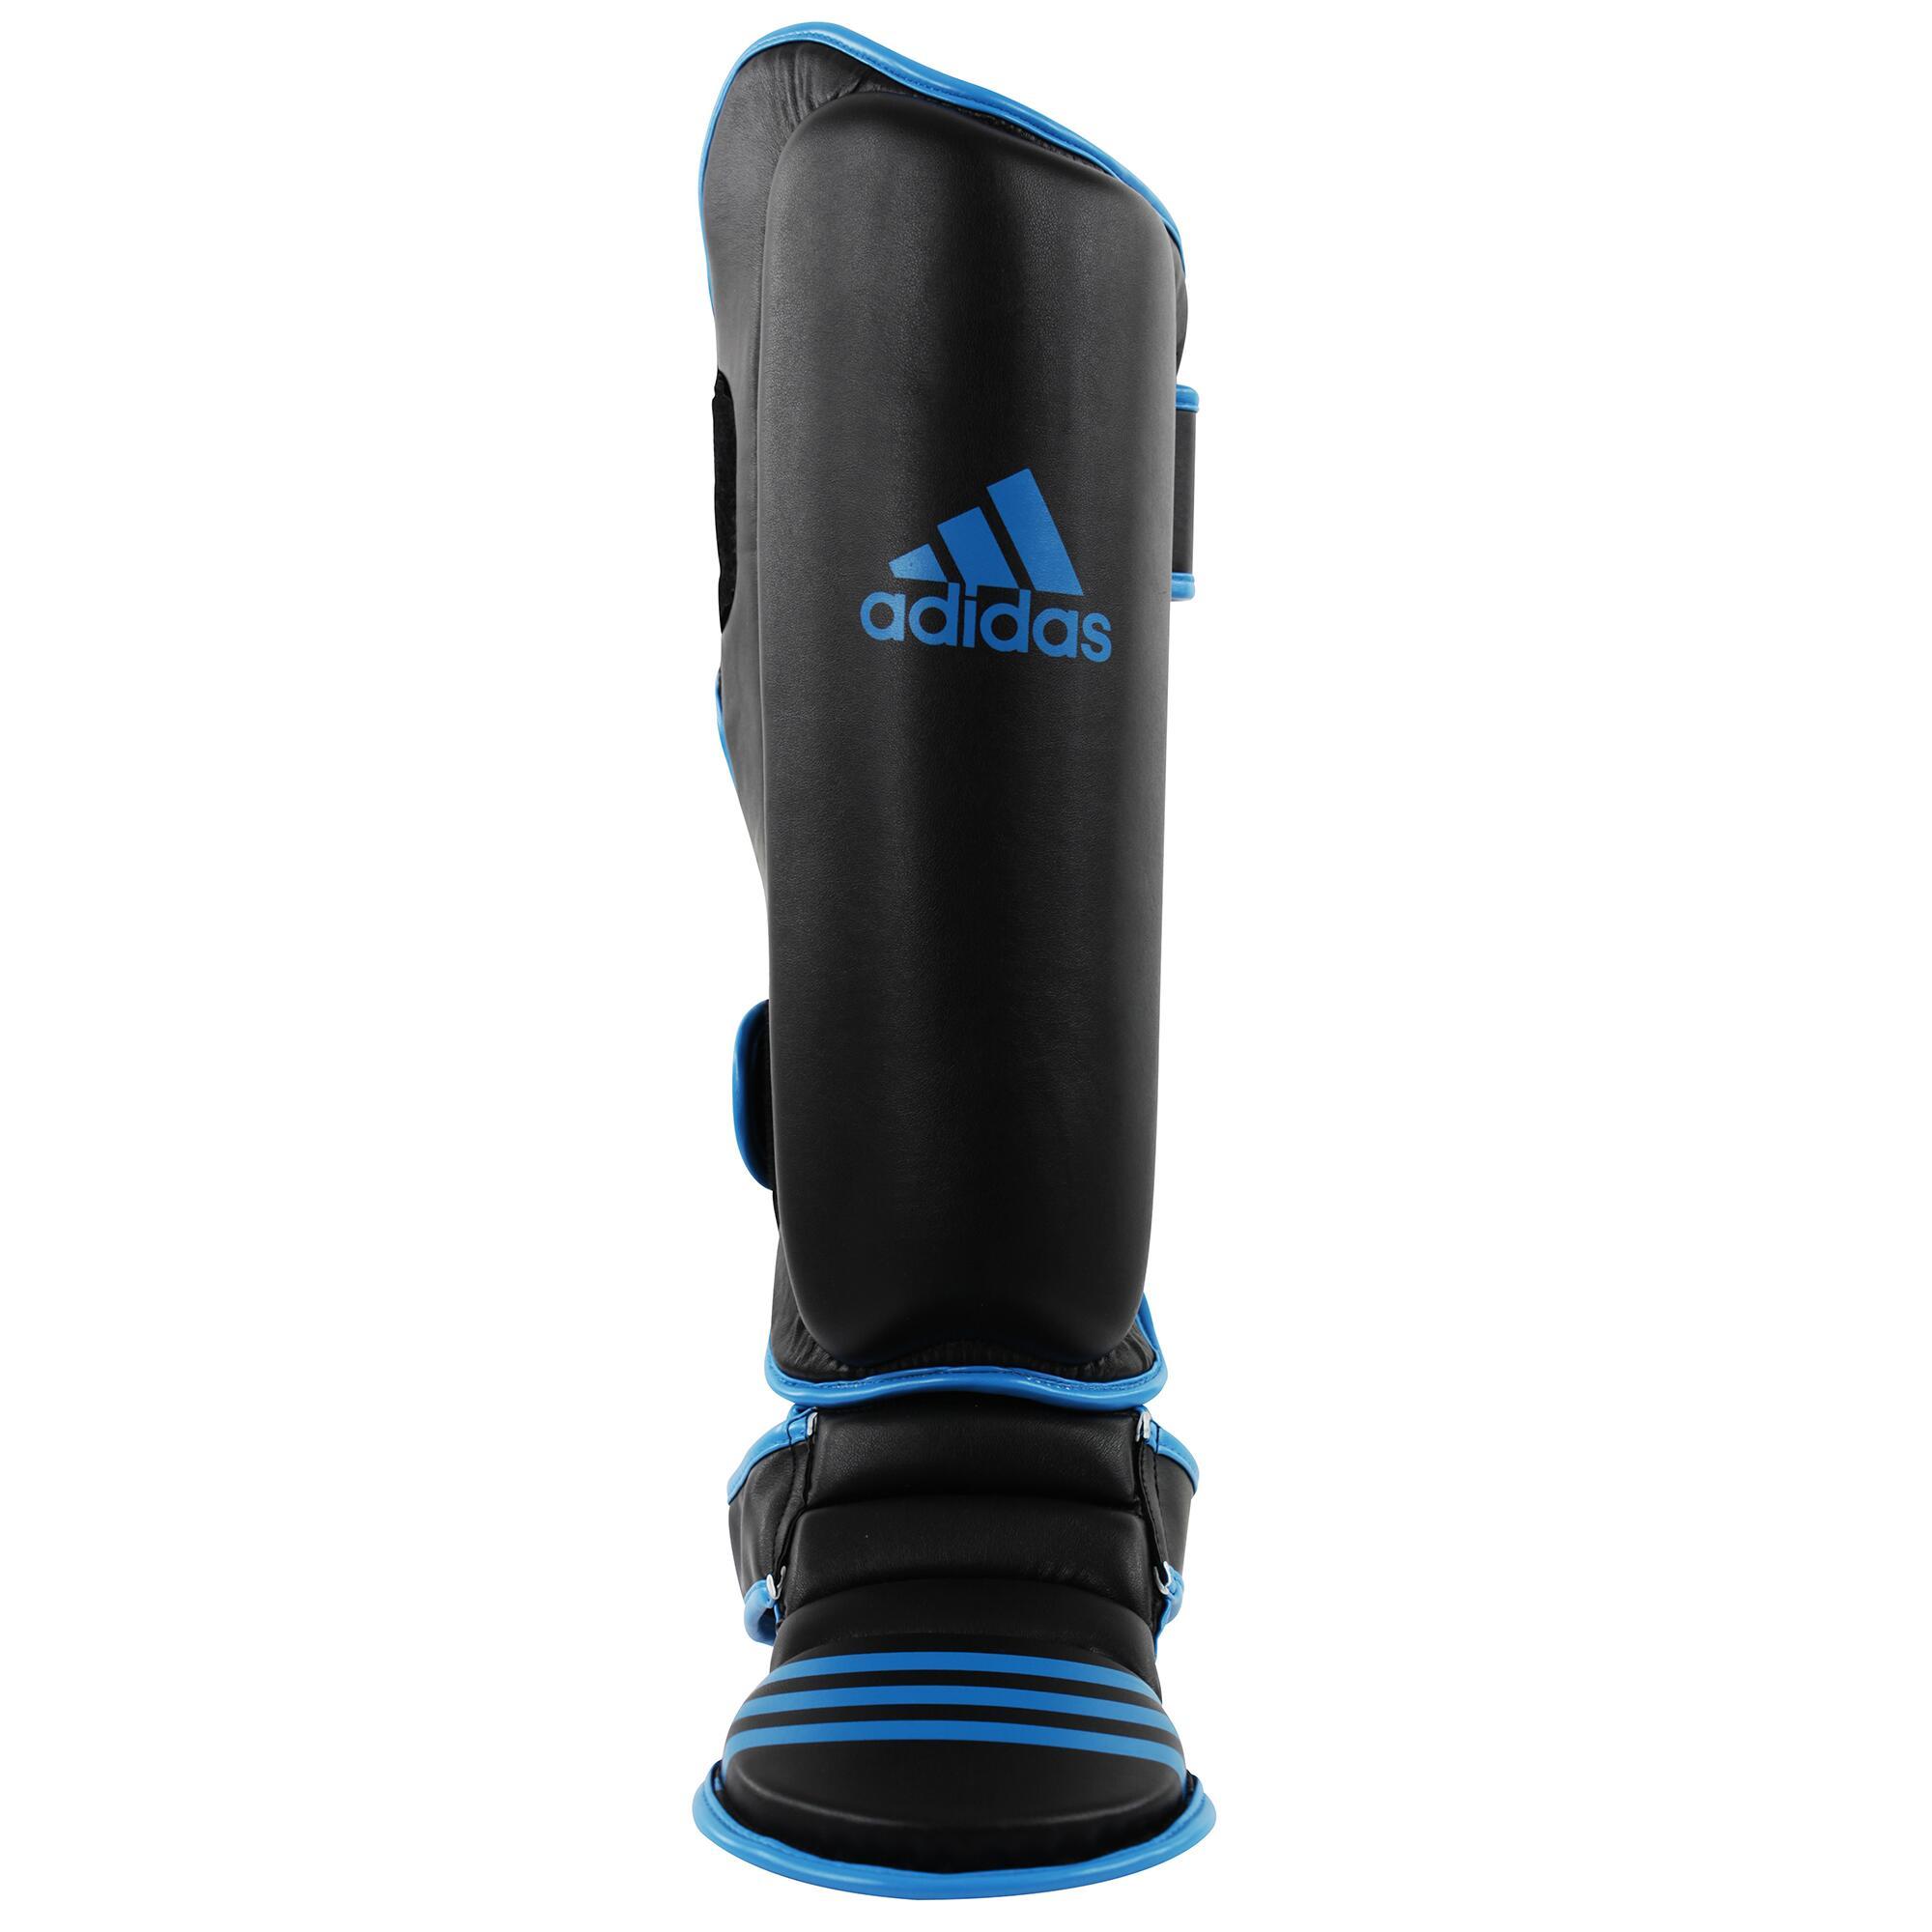 Adidas Scheen- en voetbeschermer zwart/blauw